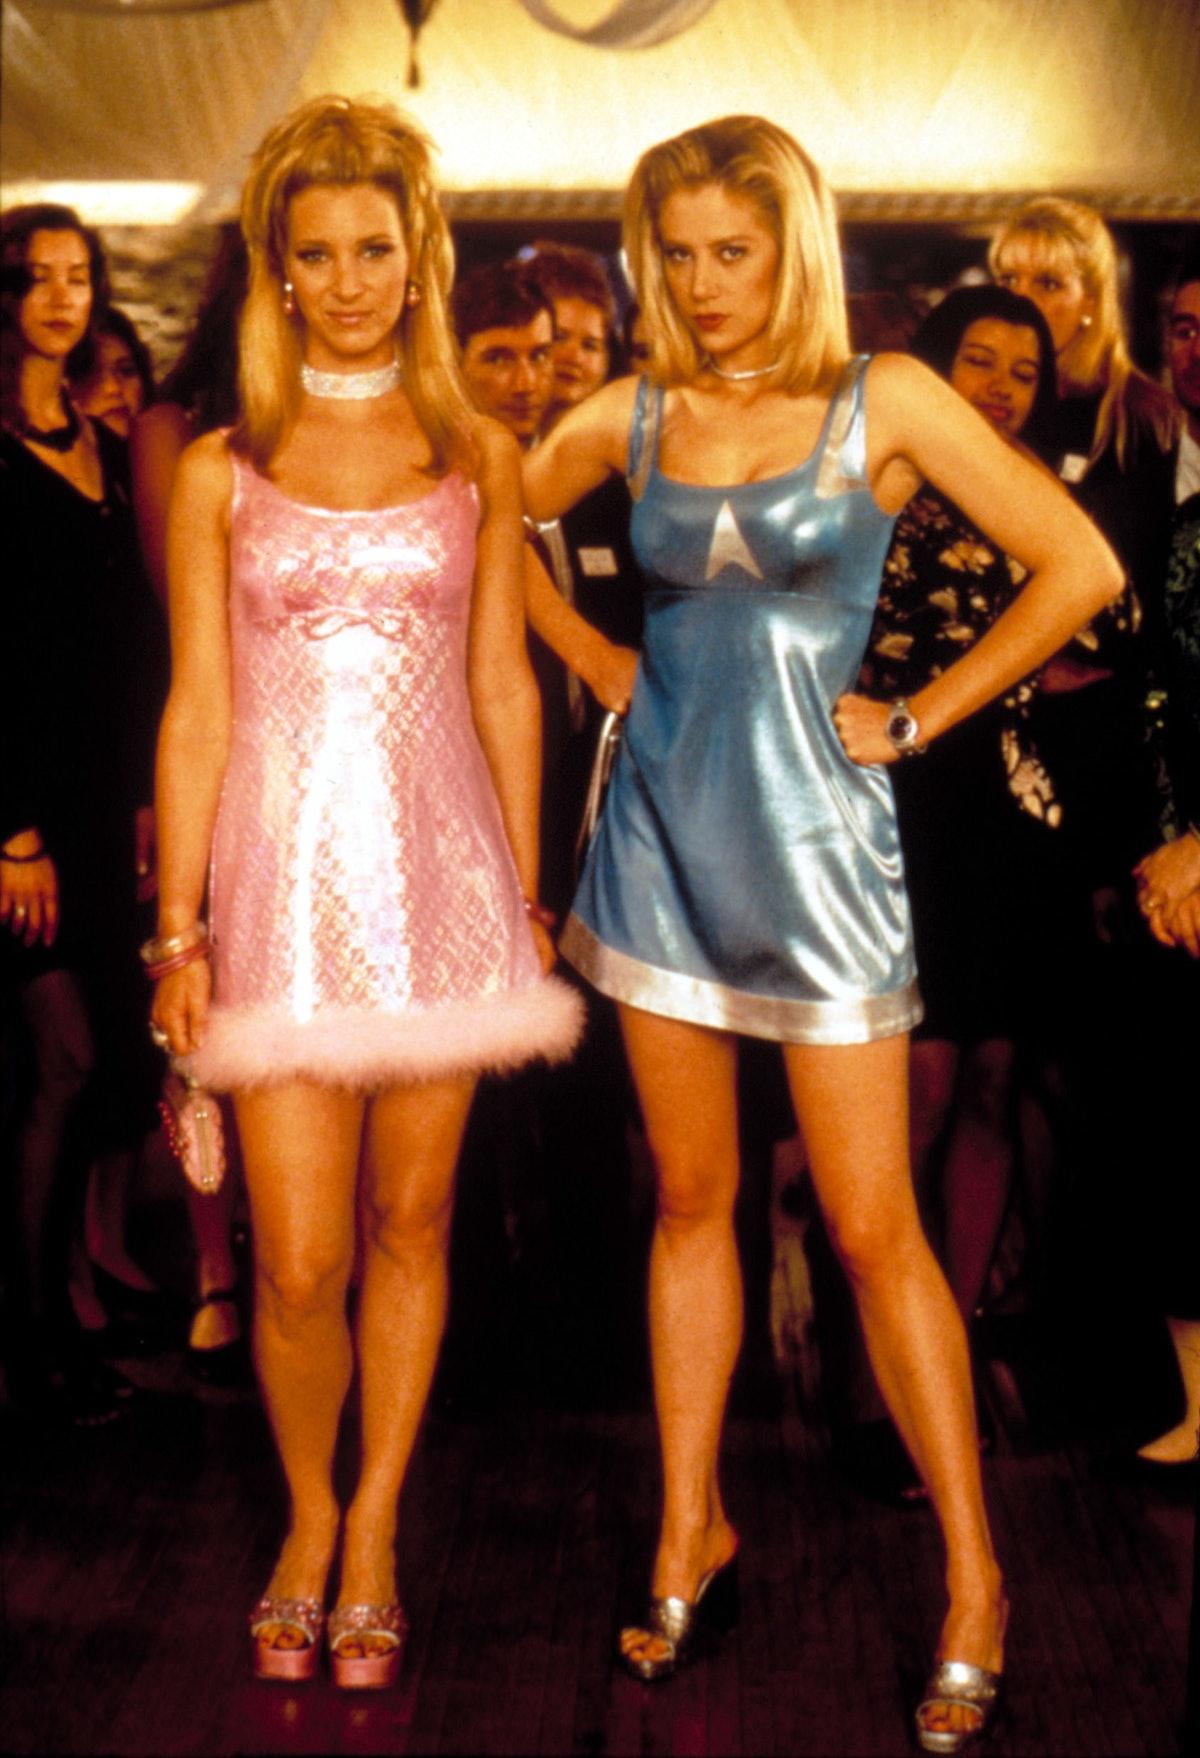 ROMY AND MICHELE'S HIGH SCHOOL REUNION, Lisa Kudrow, Mira Sorvino, 1997.